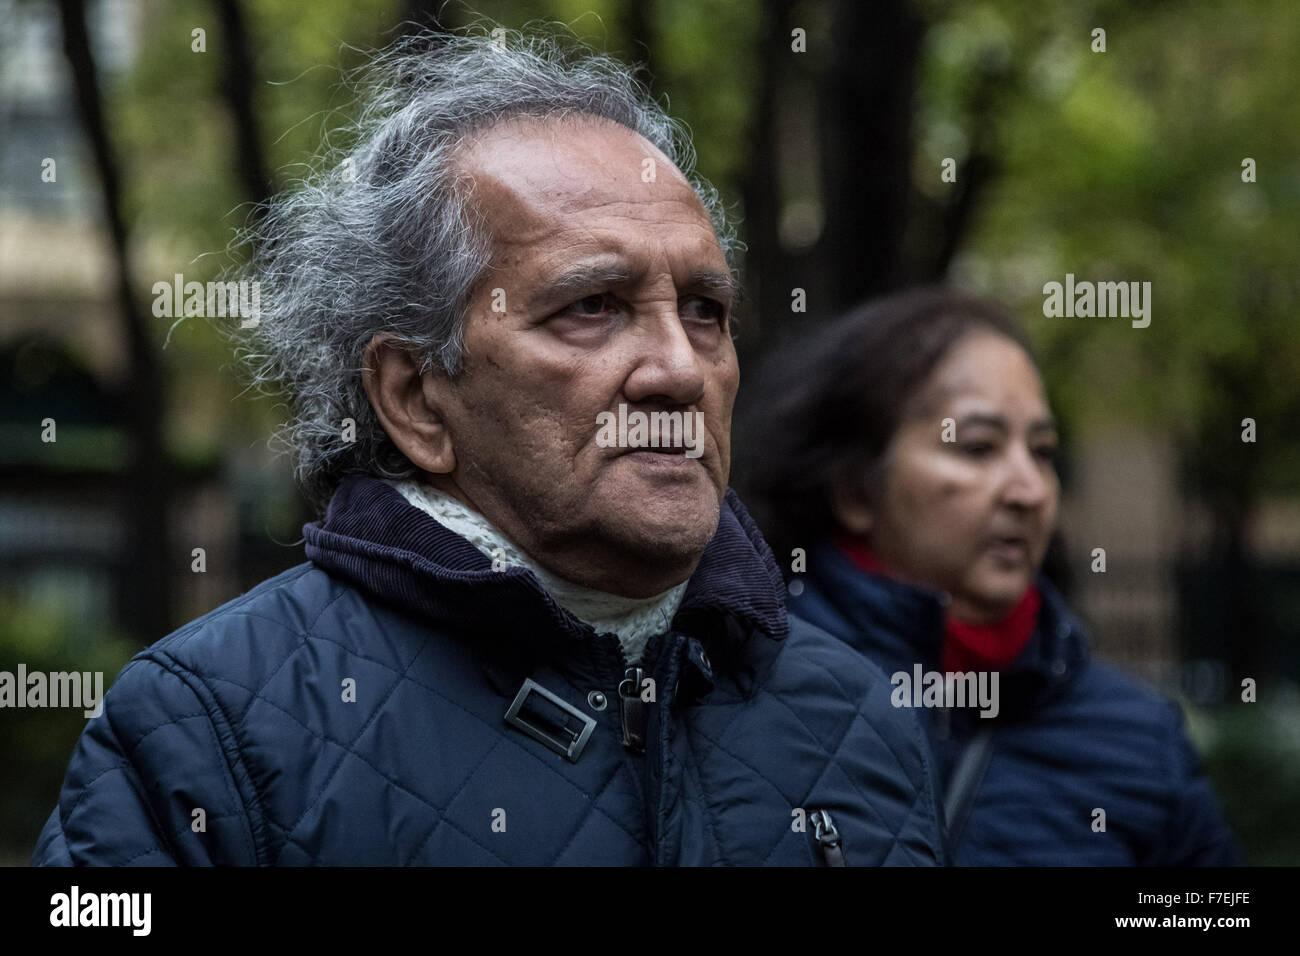 London, UK. 30th November, 2015. Aravindan Balakrishnan from the alleged extreme left-wing Maoist cult arrives at - Stock Image